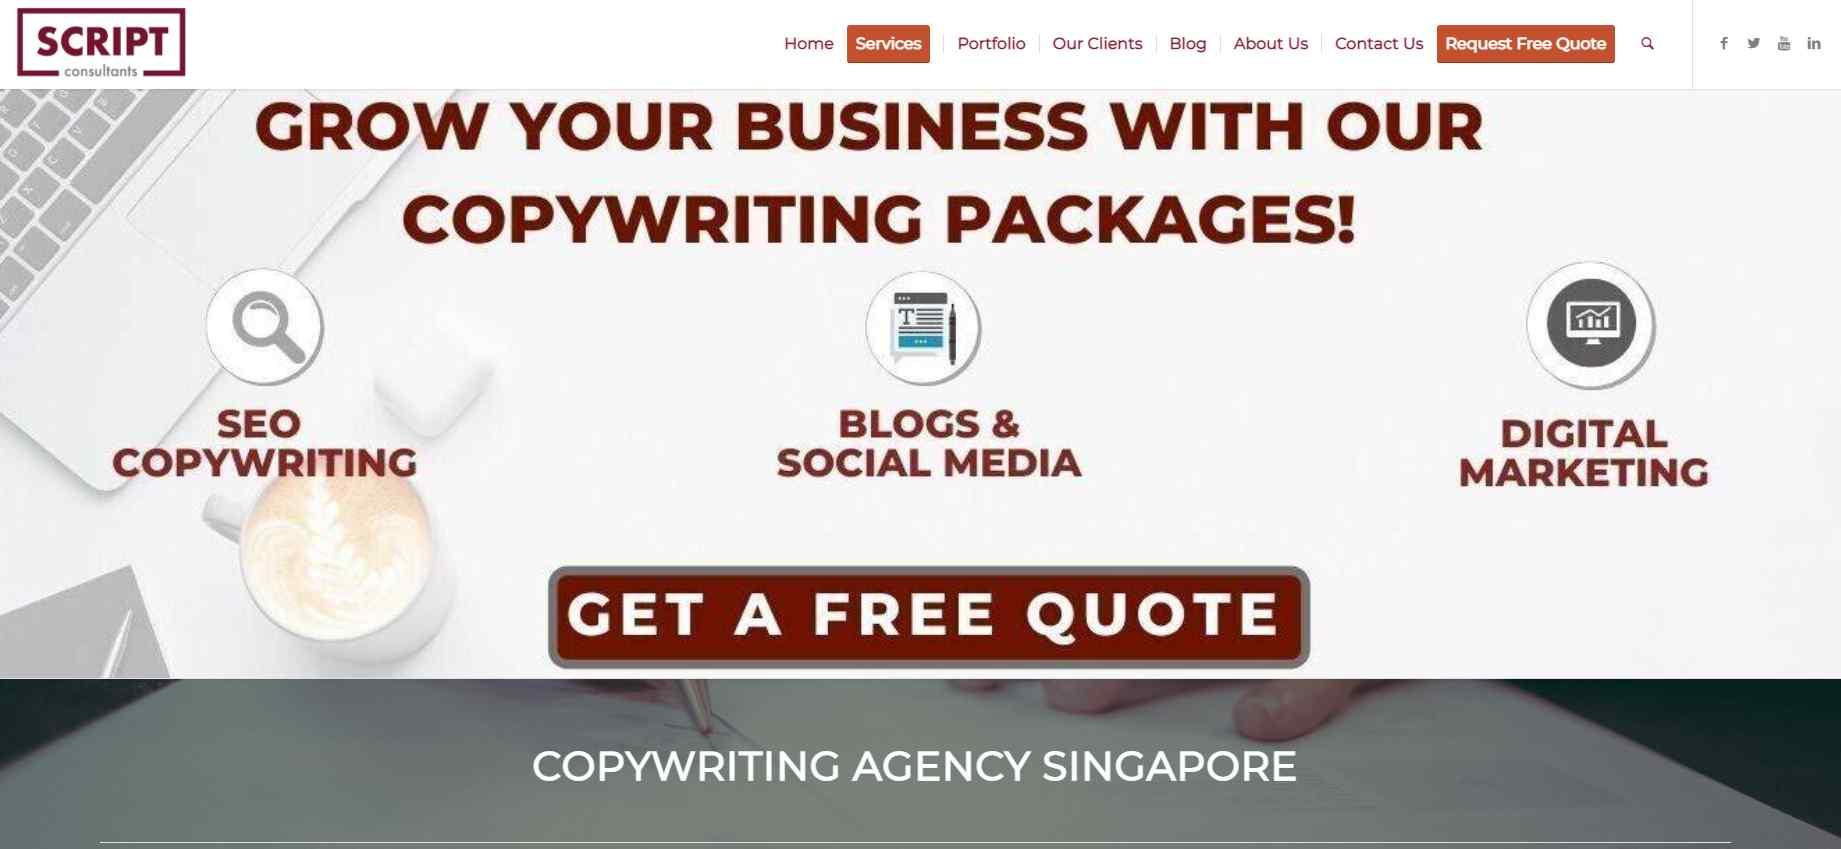 script Website Copywriting The Complete Guide